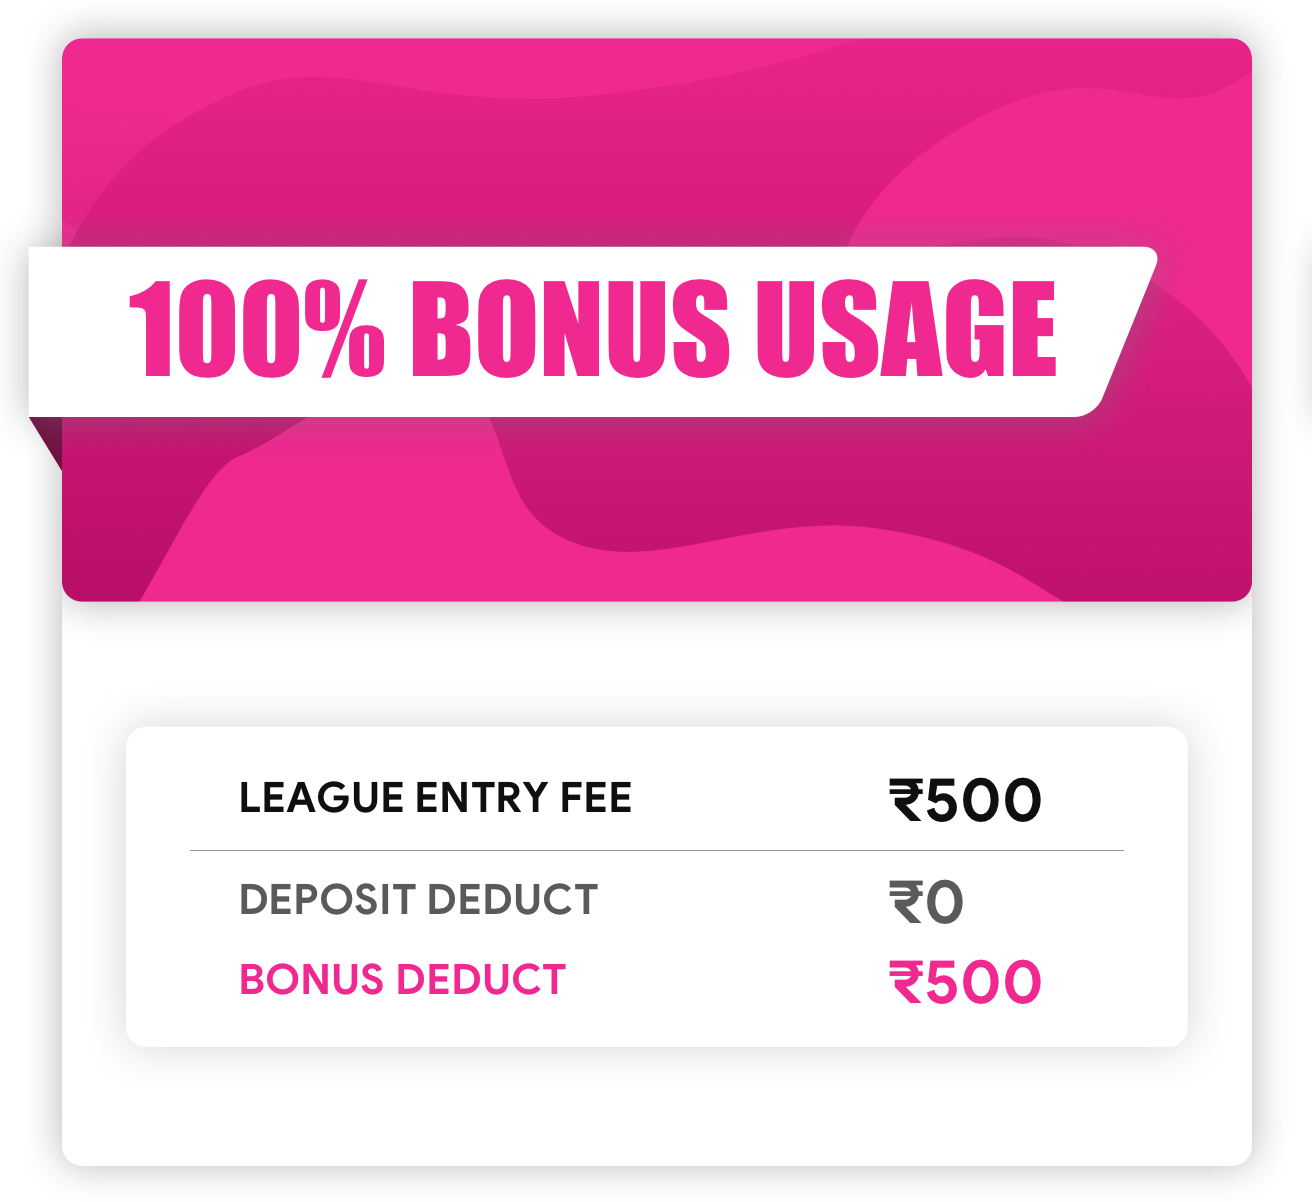 HalaPlay - Play Fantasy Cricket, Football & Kabaddi and Win upto ₹2